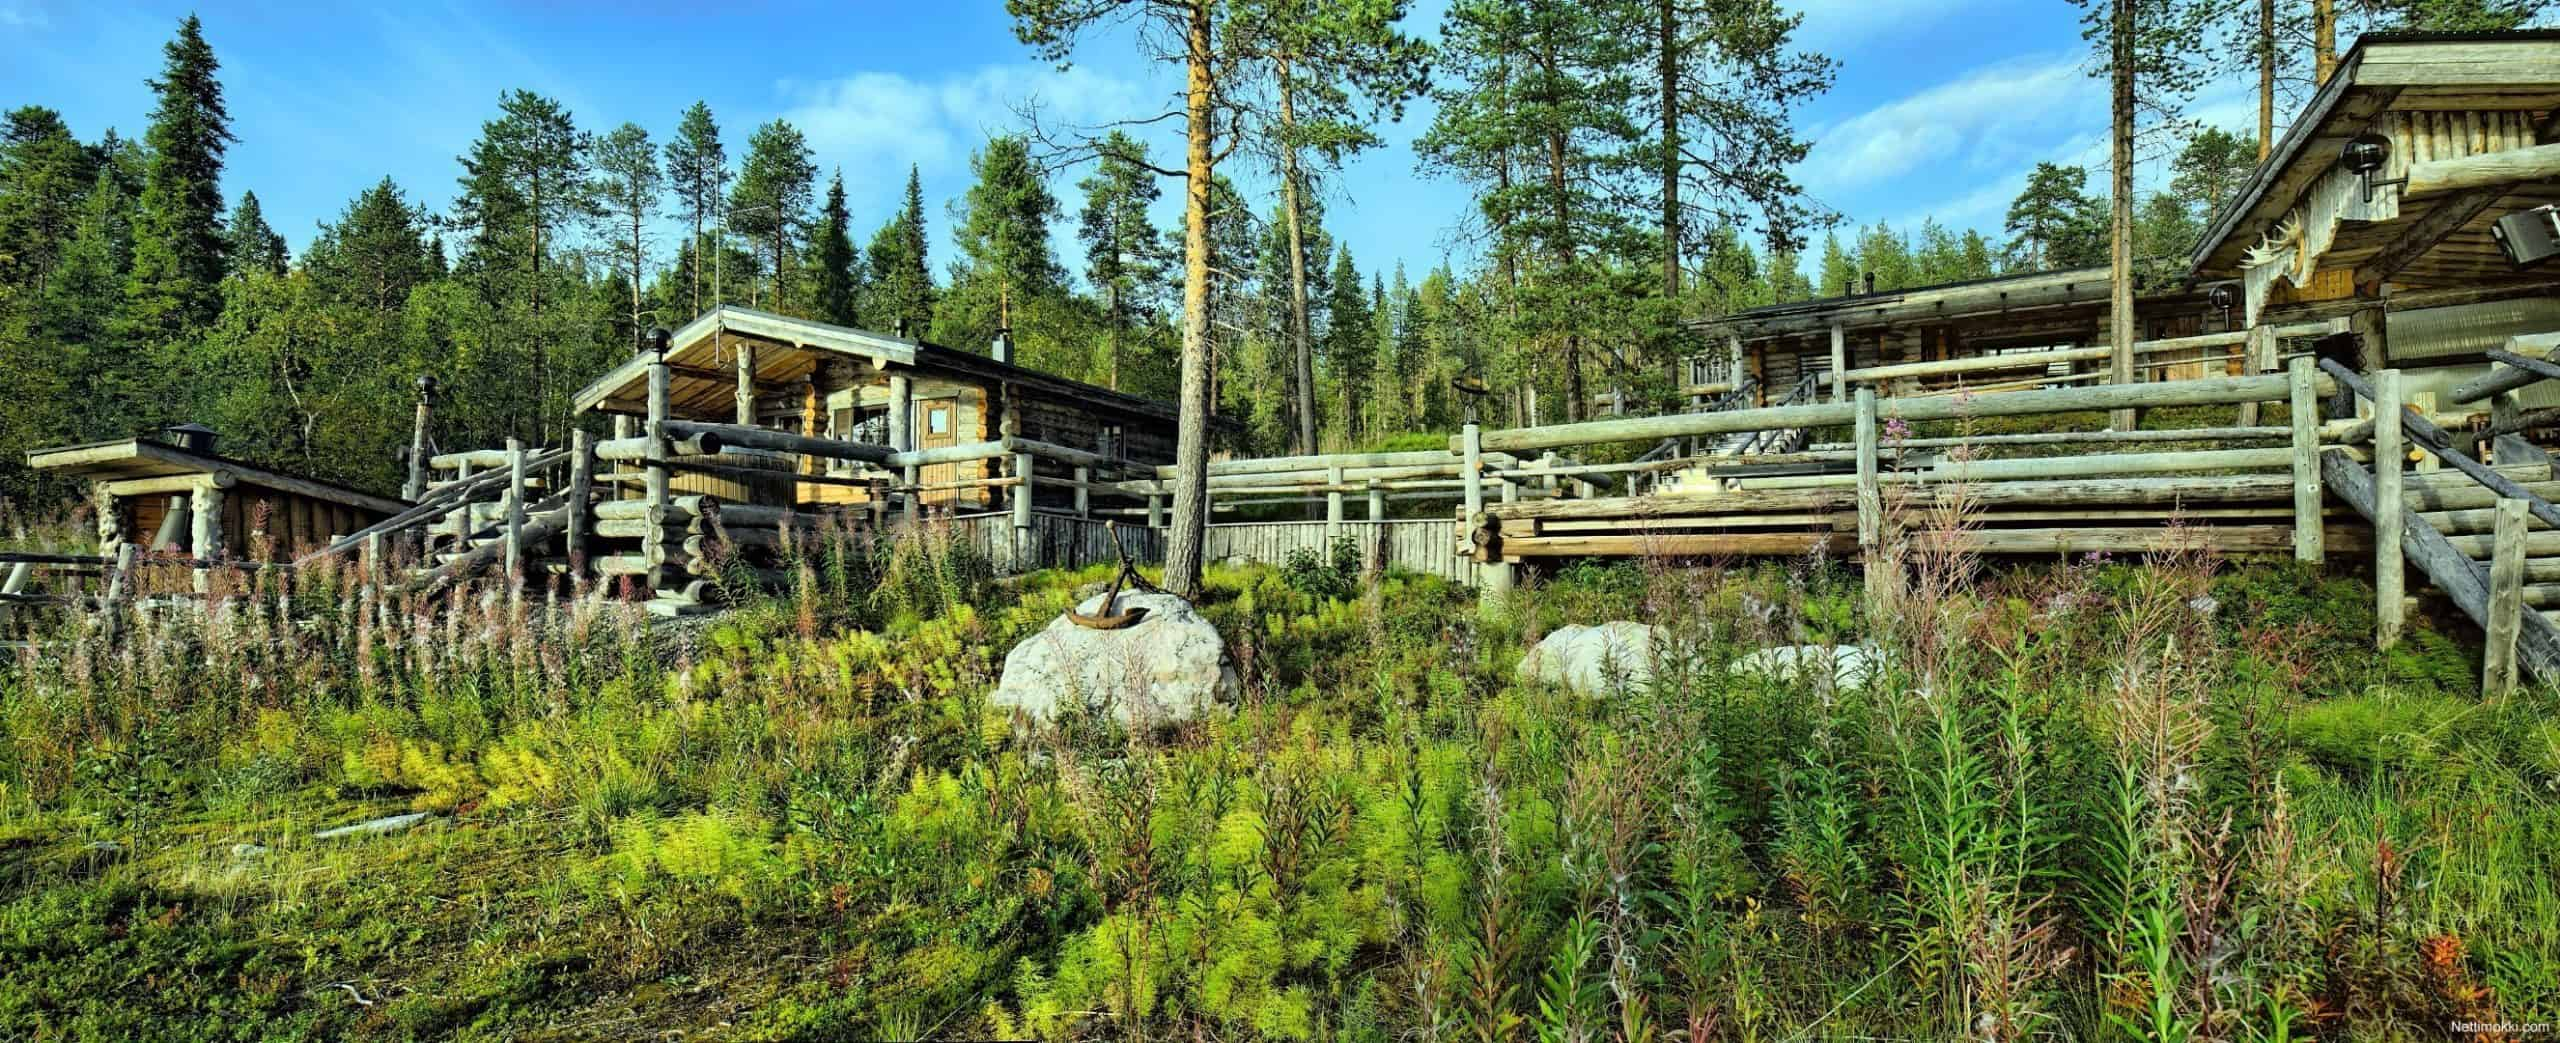 Lappland Snowkite-Camp 22.01.-05.02. 2022 9